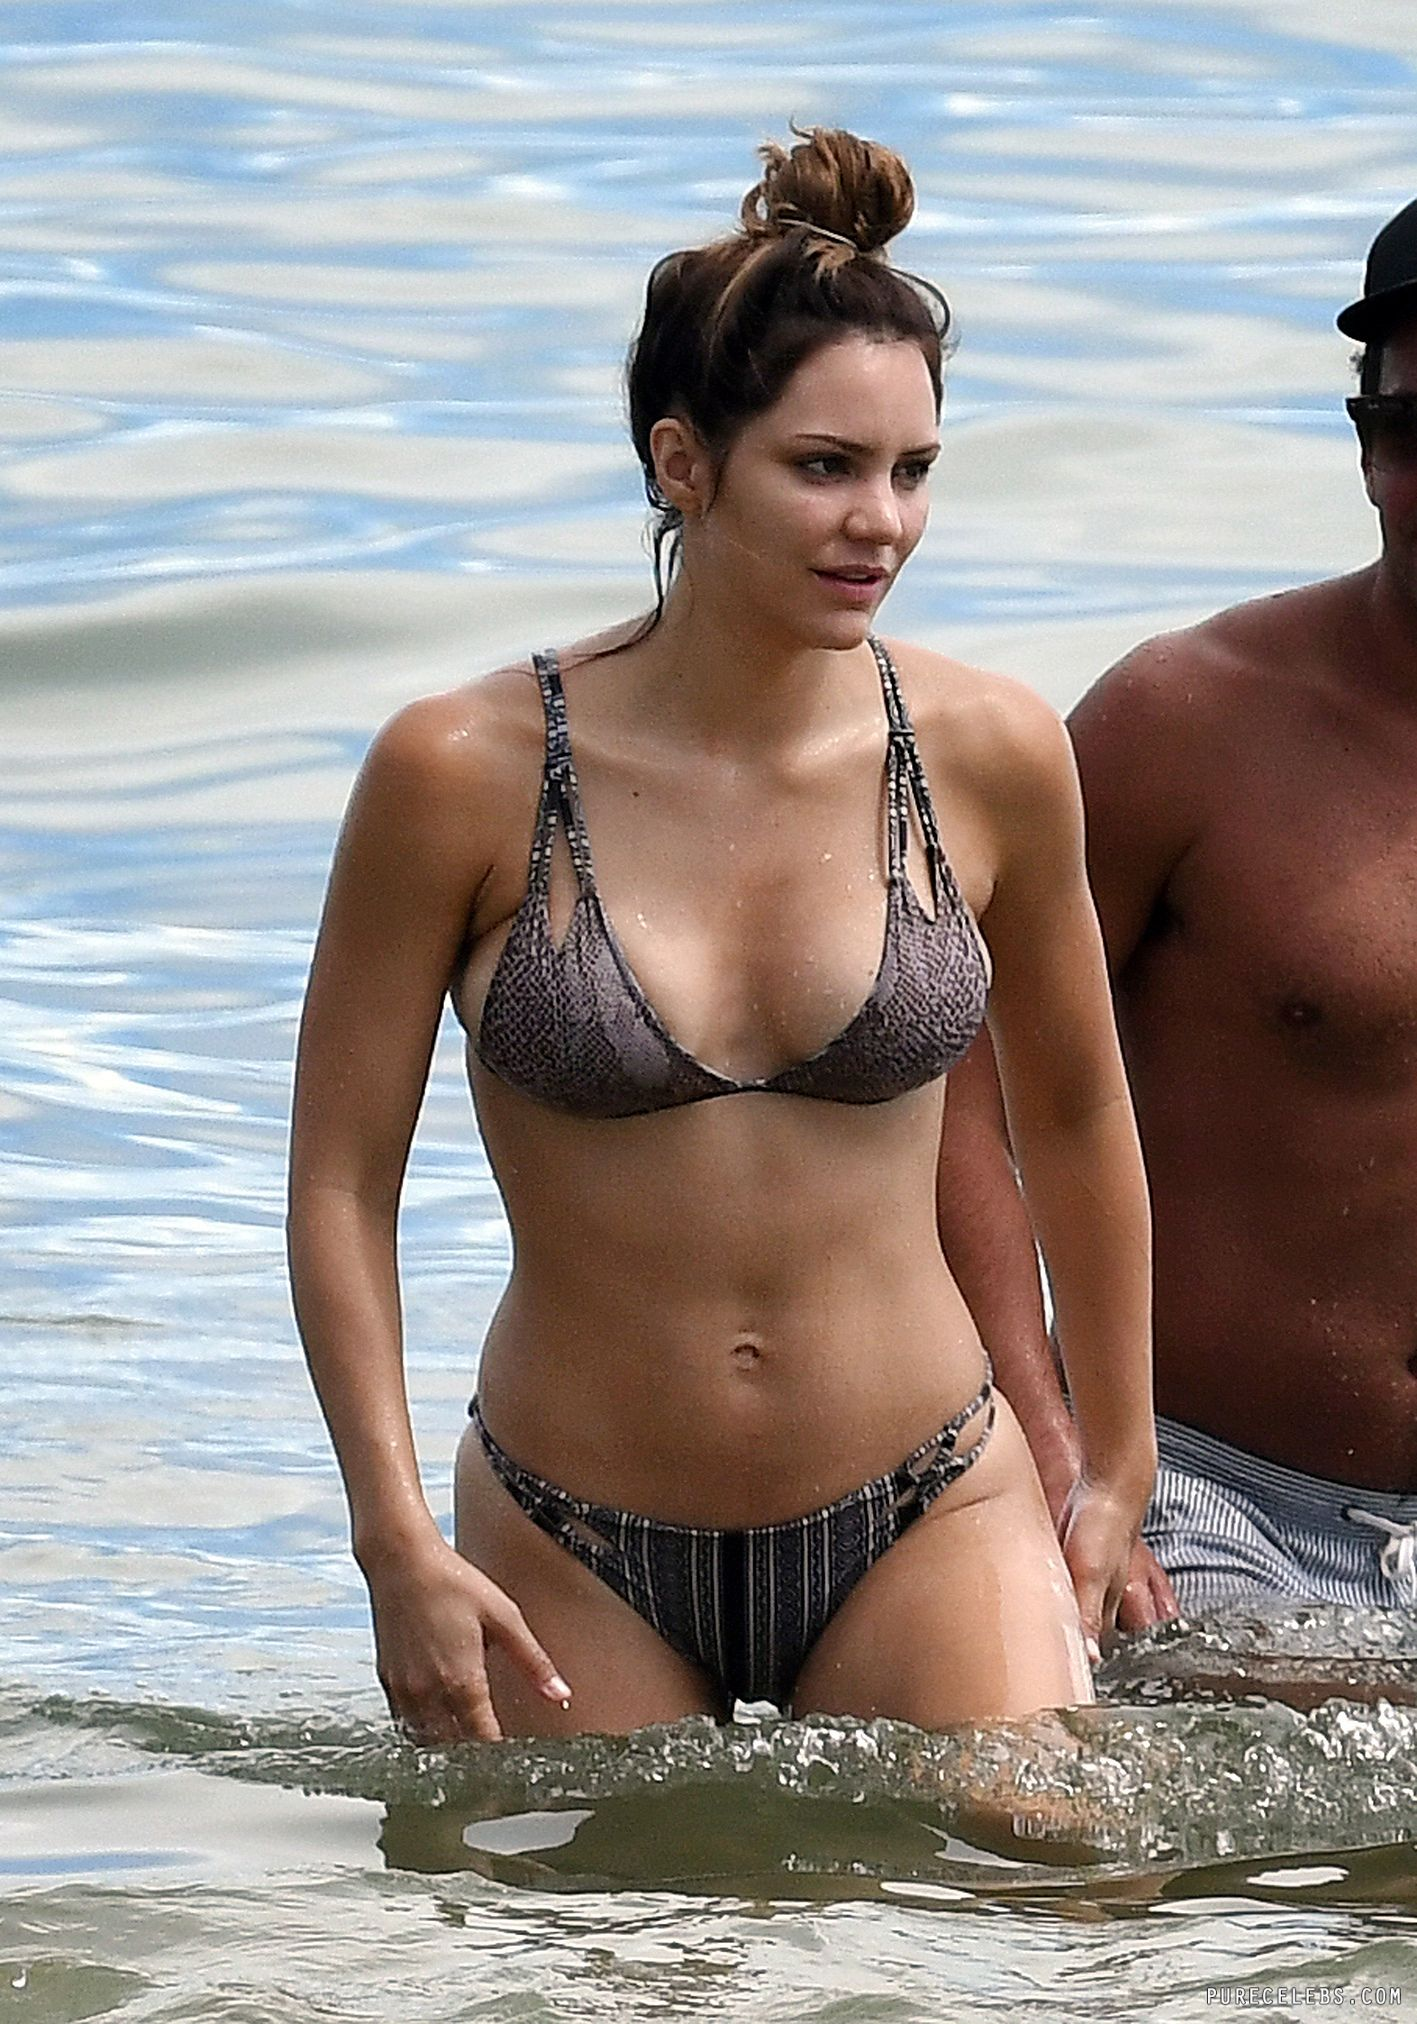 Katharine Mcphee Great Cleavage In Wet Bikini Purecelebs Com